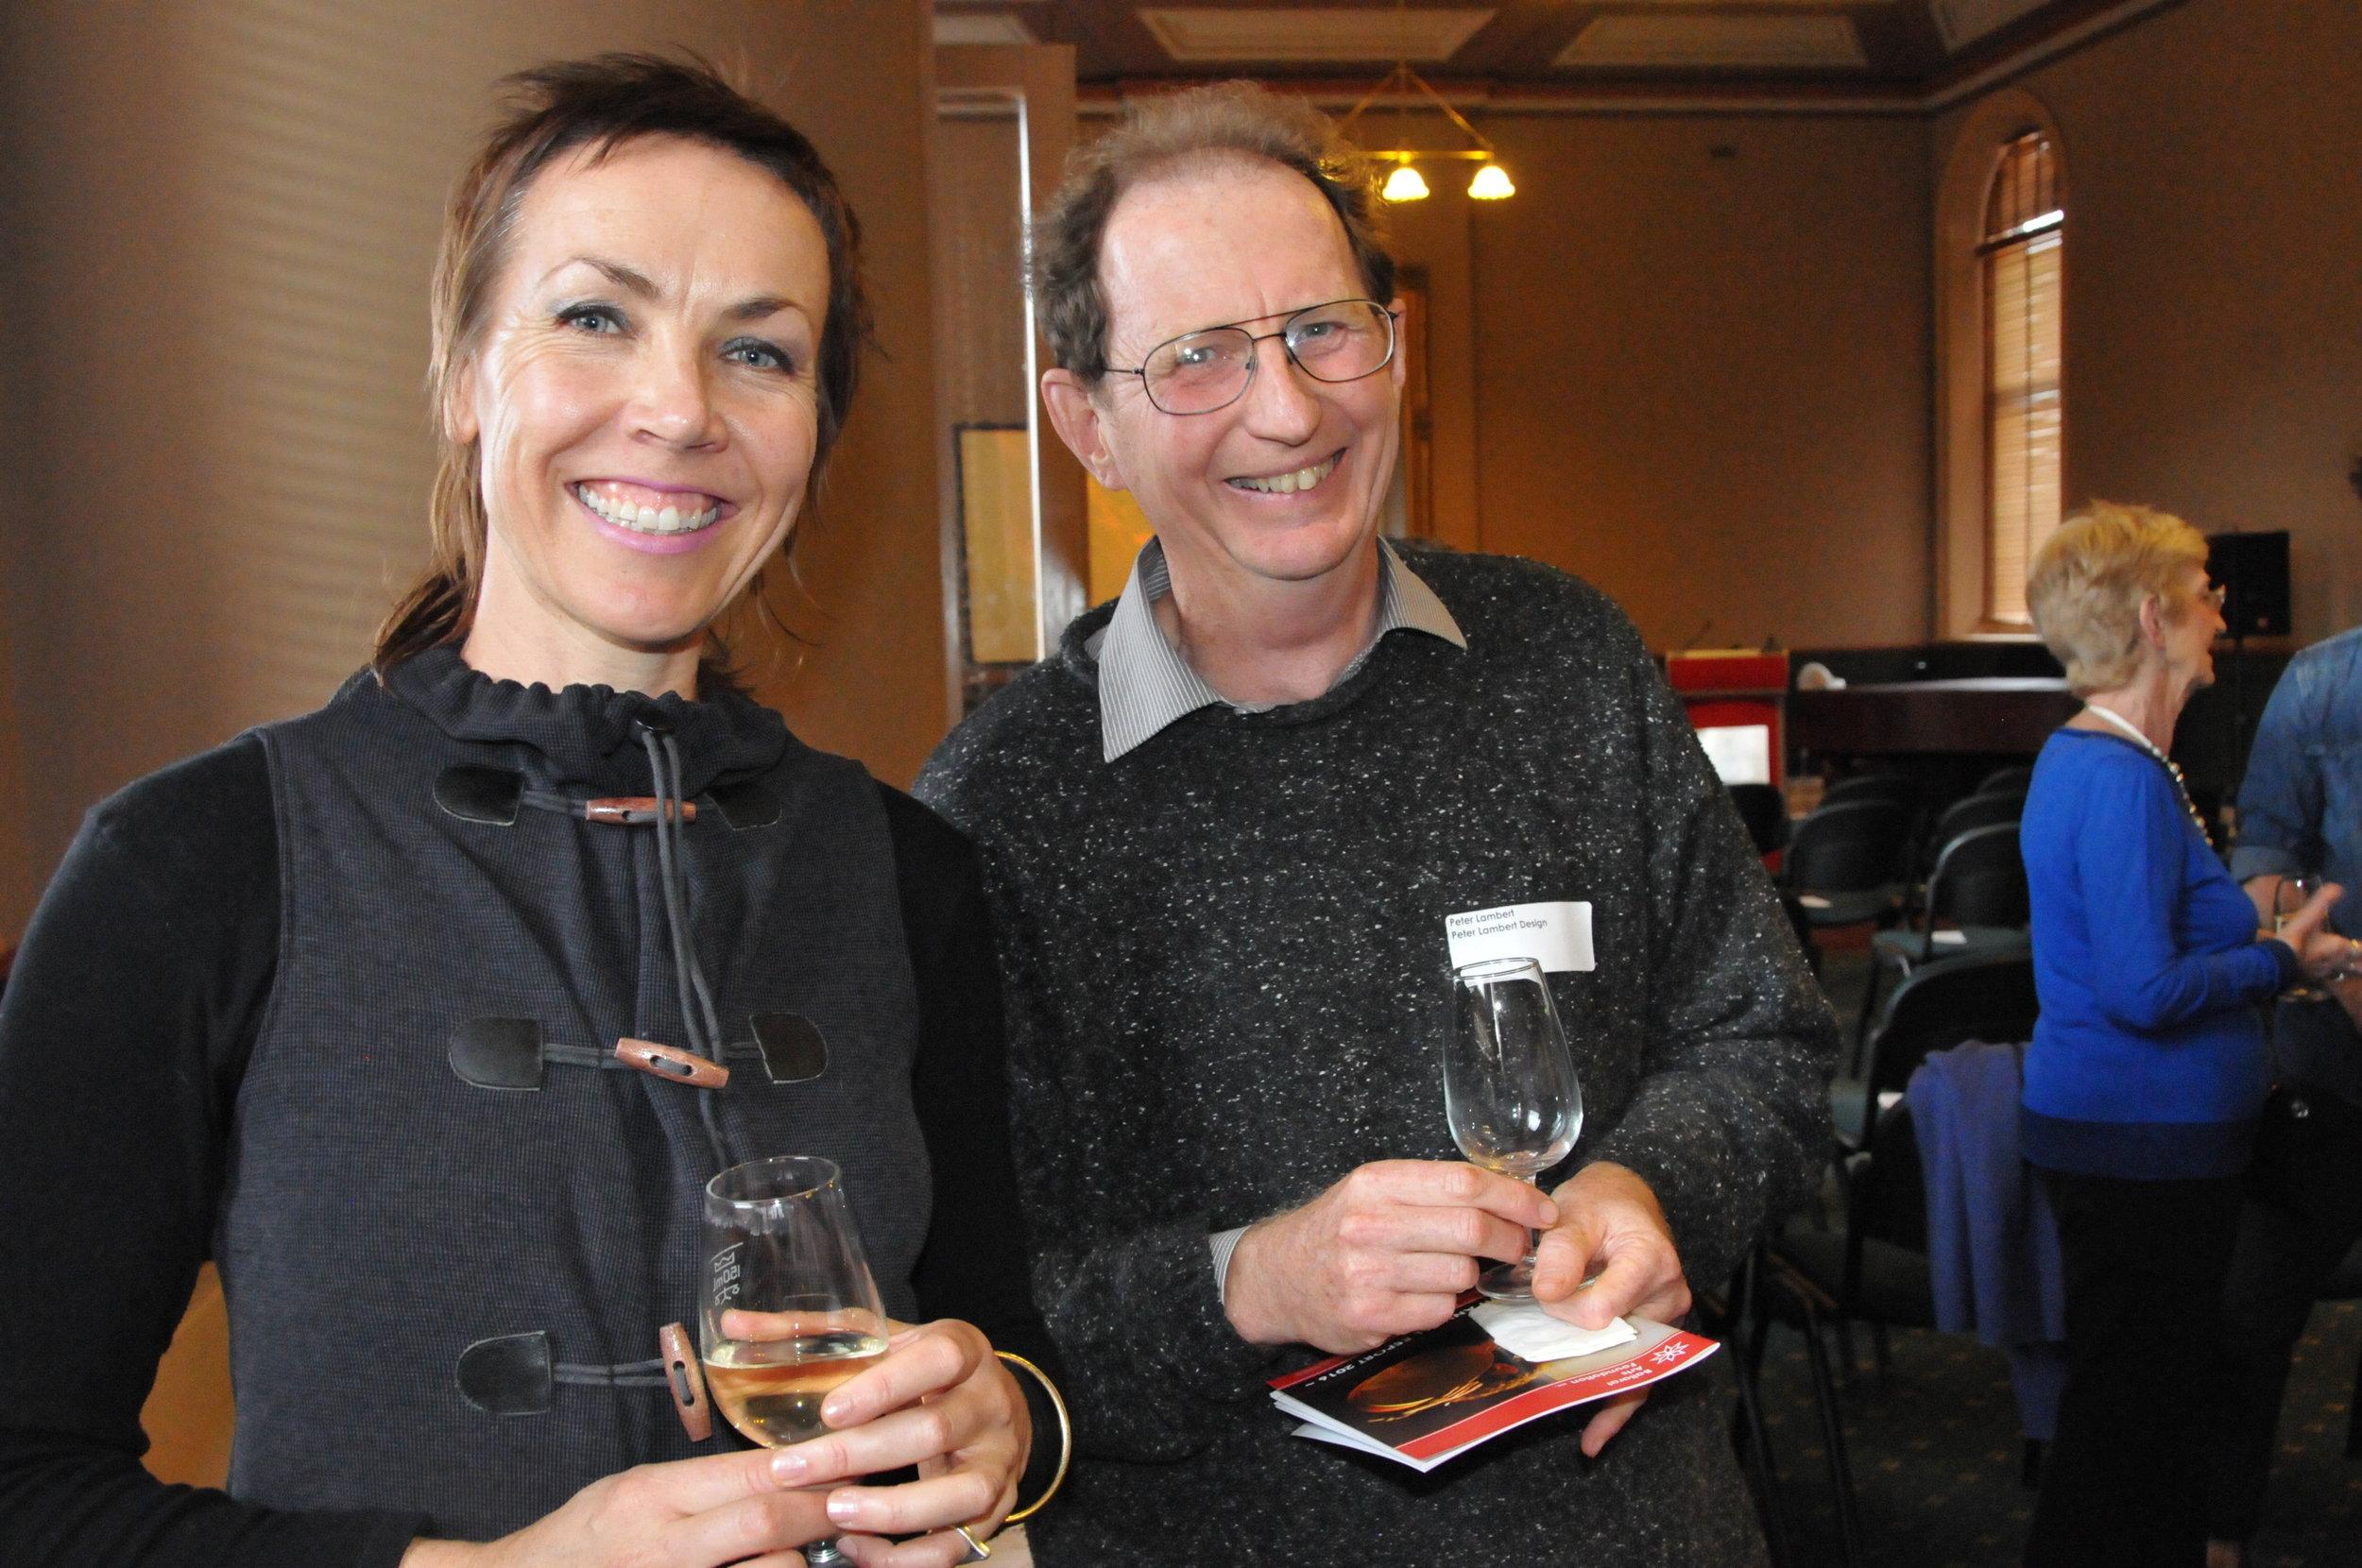 Kat Pengelly and Peter Lambert